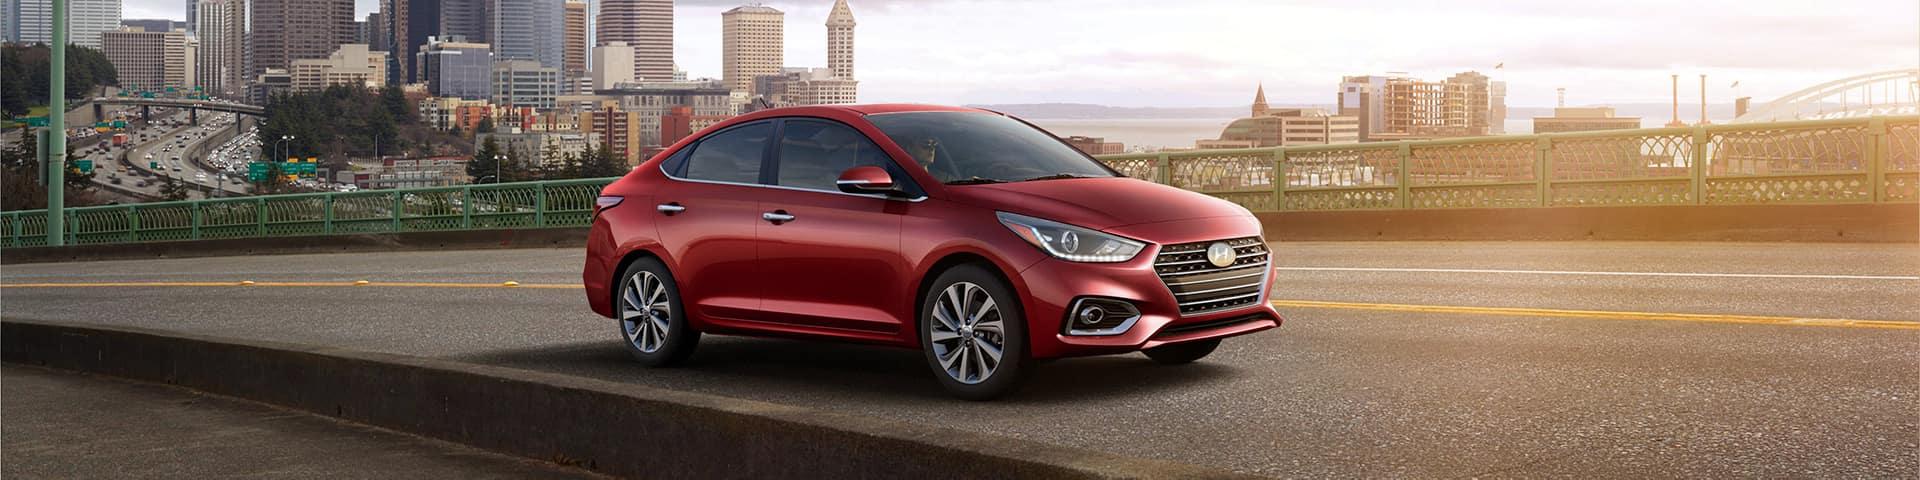 Boch Hyundai is a Car Dealership near Brockton MA | Red MY20 Hyundai Accent driving on highway outside city